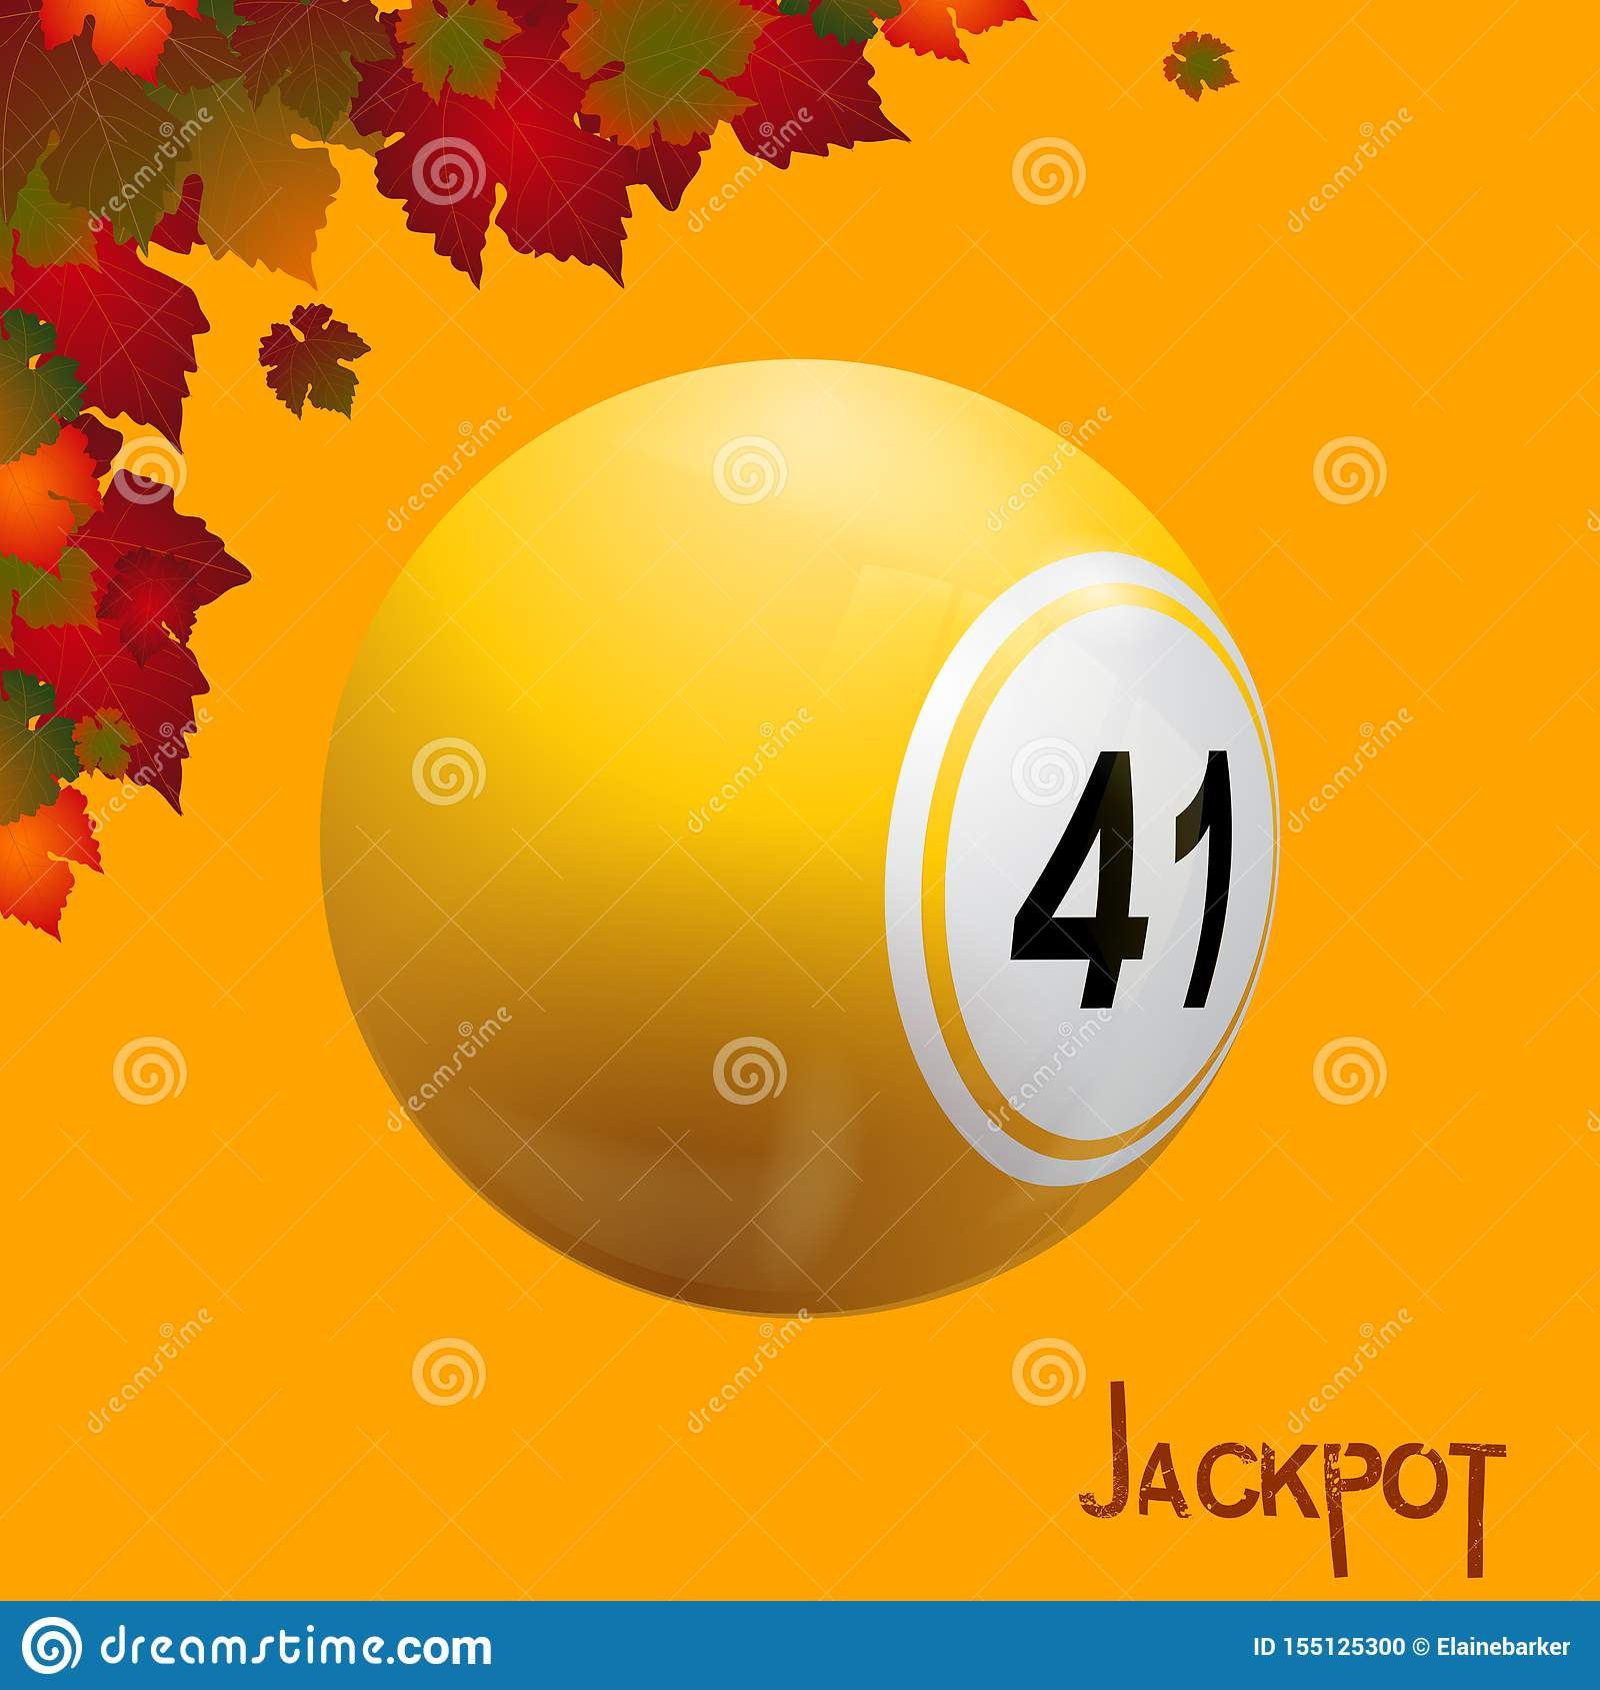 bingo lotto jackpot chancen